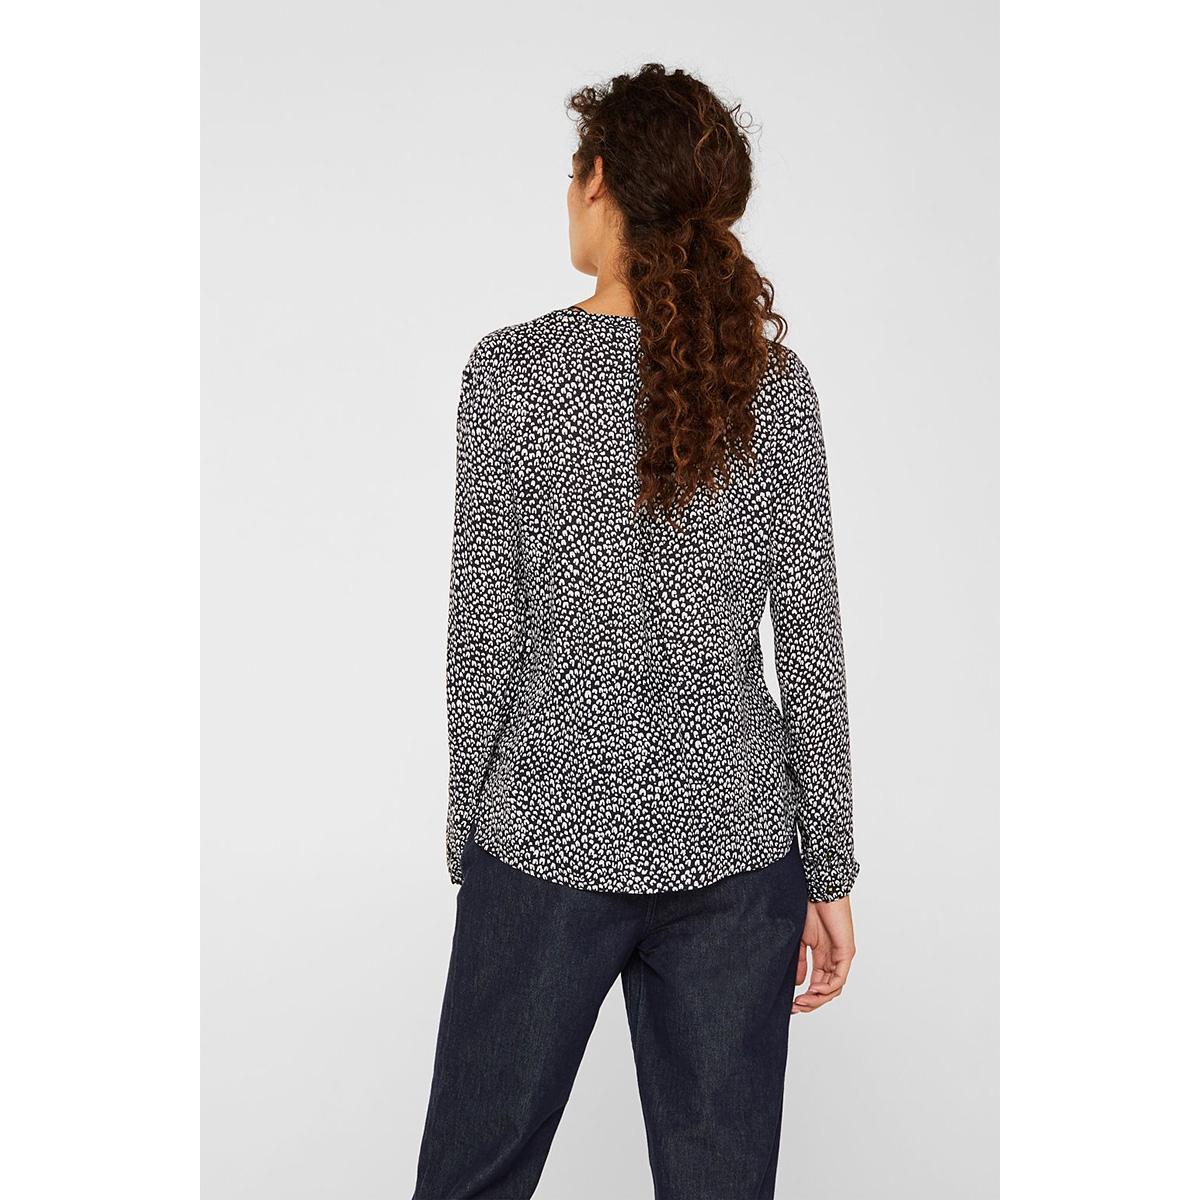 fijne crepe blouse met print 129ee1f005 esprit blouse e003